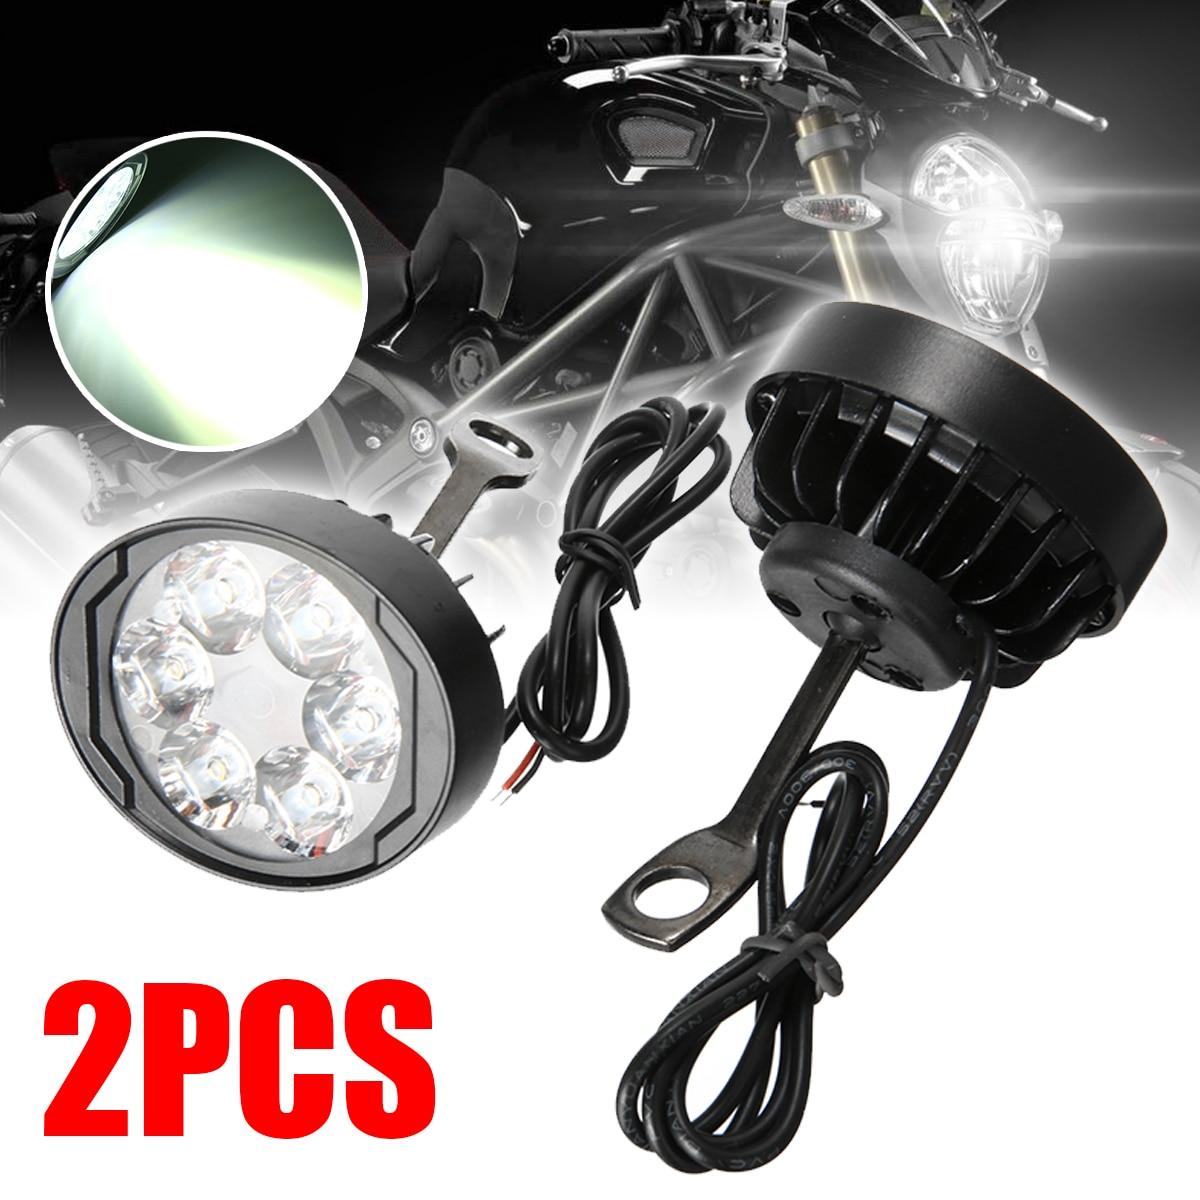 1Pair 6LED White Motorcycle Spot Fog Light Front Headlight Assist Lamp ABS Plastic Metal Stem Waterproof 6000 6500K For Honda